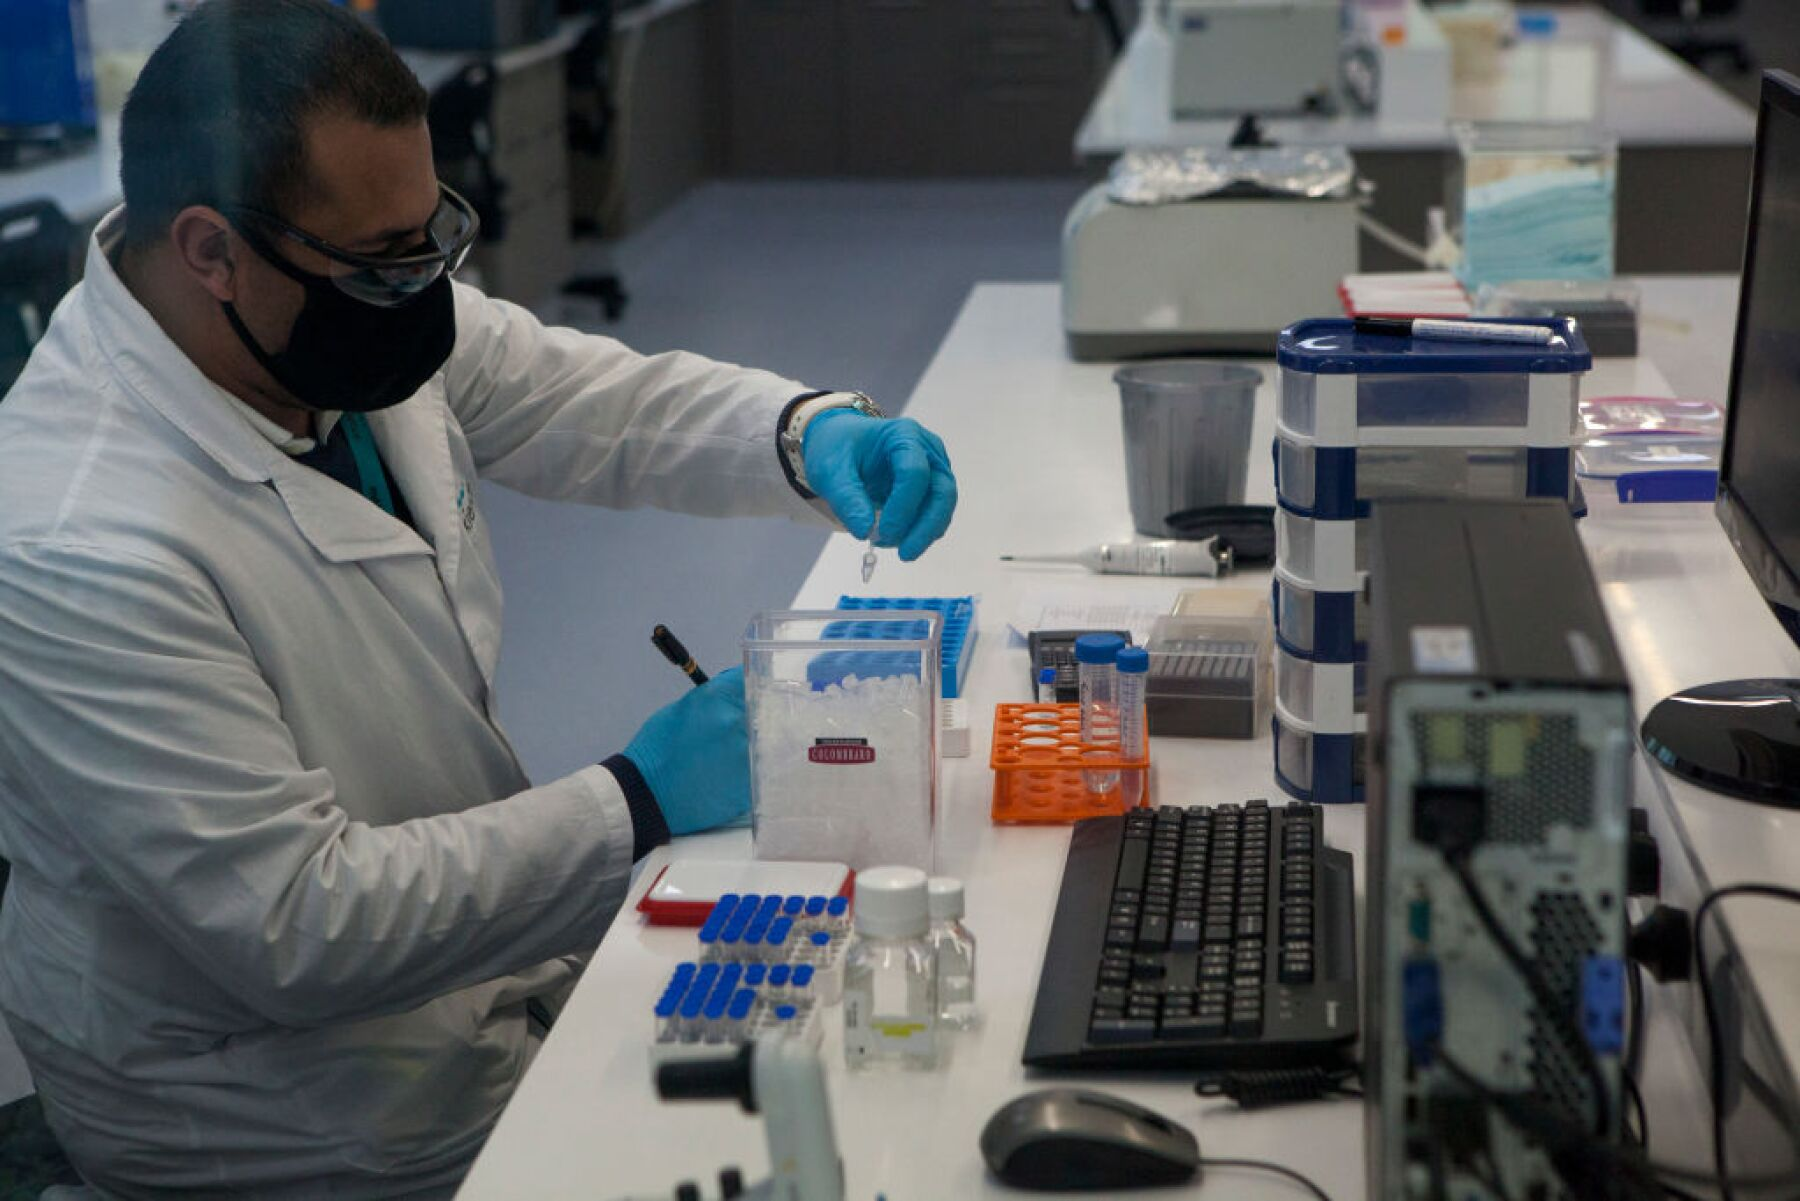 Argentine Laboratory To Co-Produce Oxford Coronavirus Vaccine